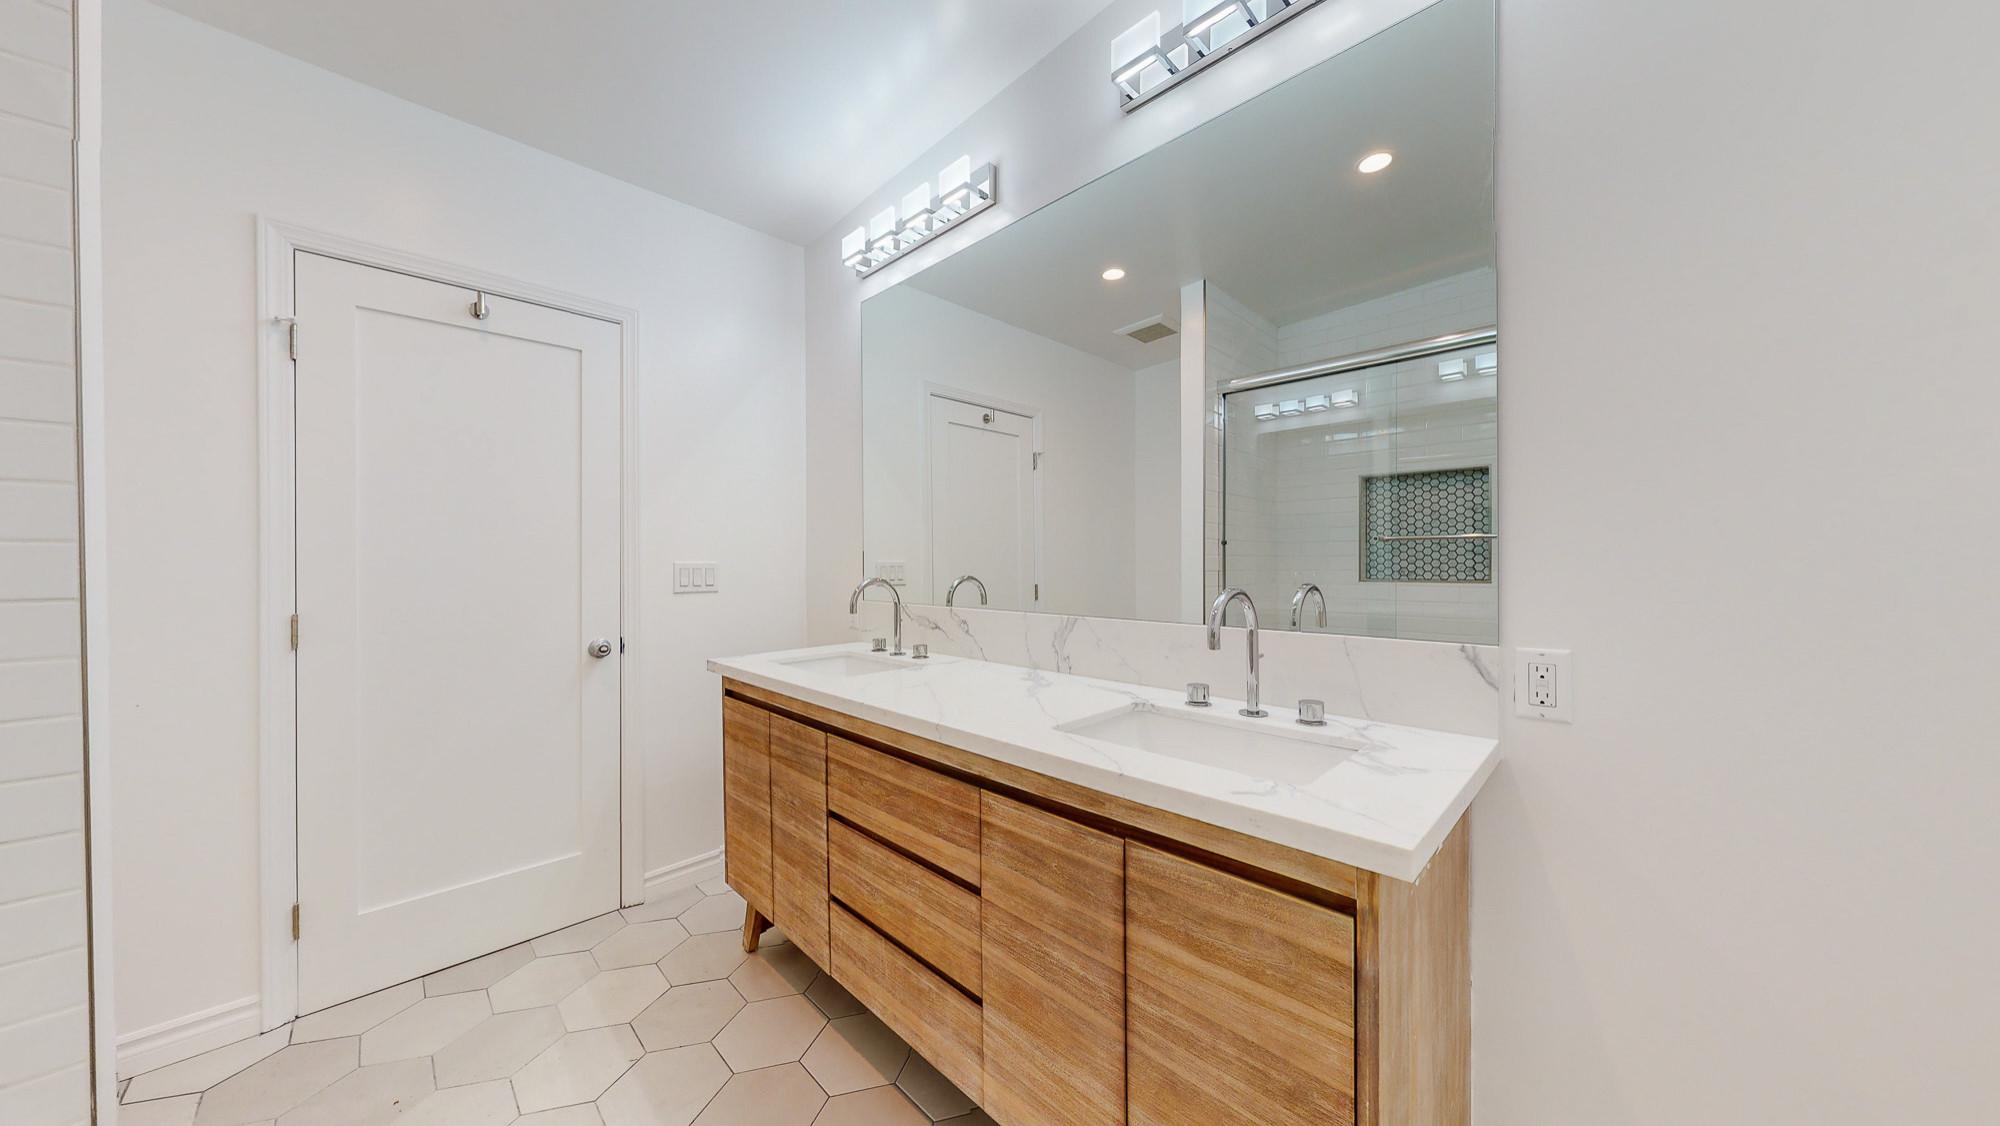 Full Interior Remodel Guest Bathroom